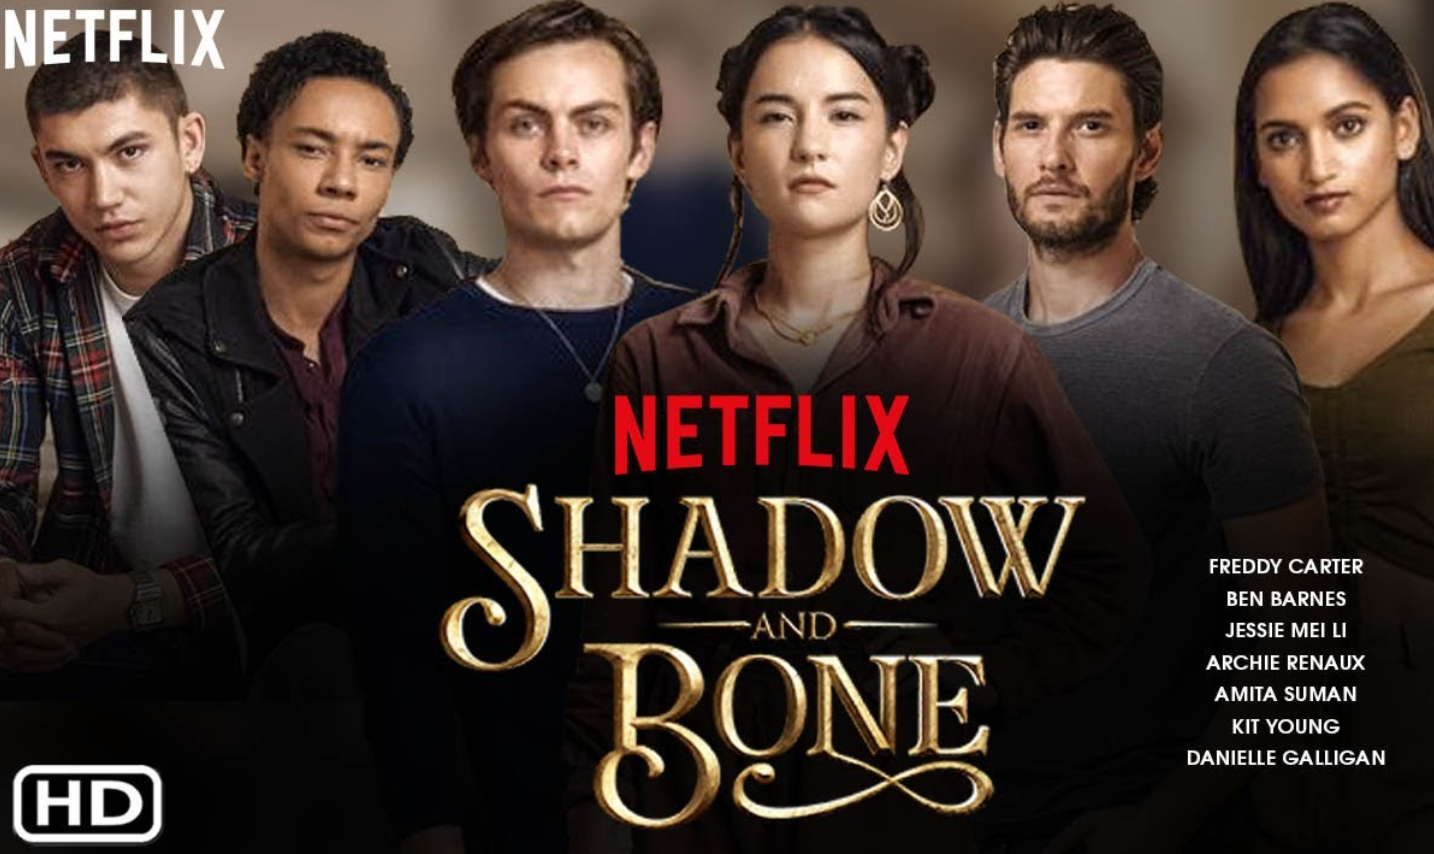 Netflix 'Shadow And Bone' Fragmanını Paylaştı! 2021